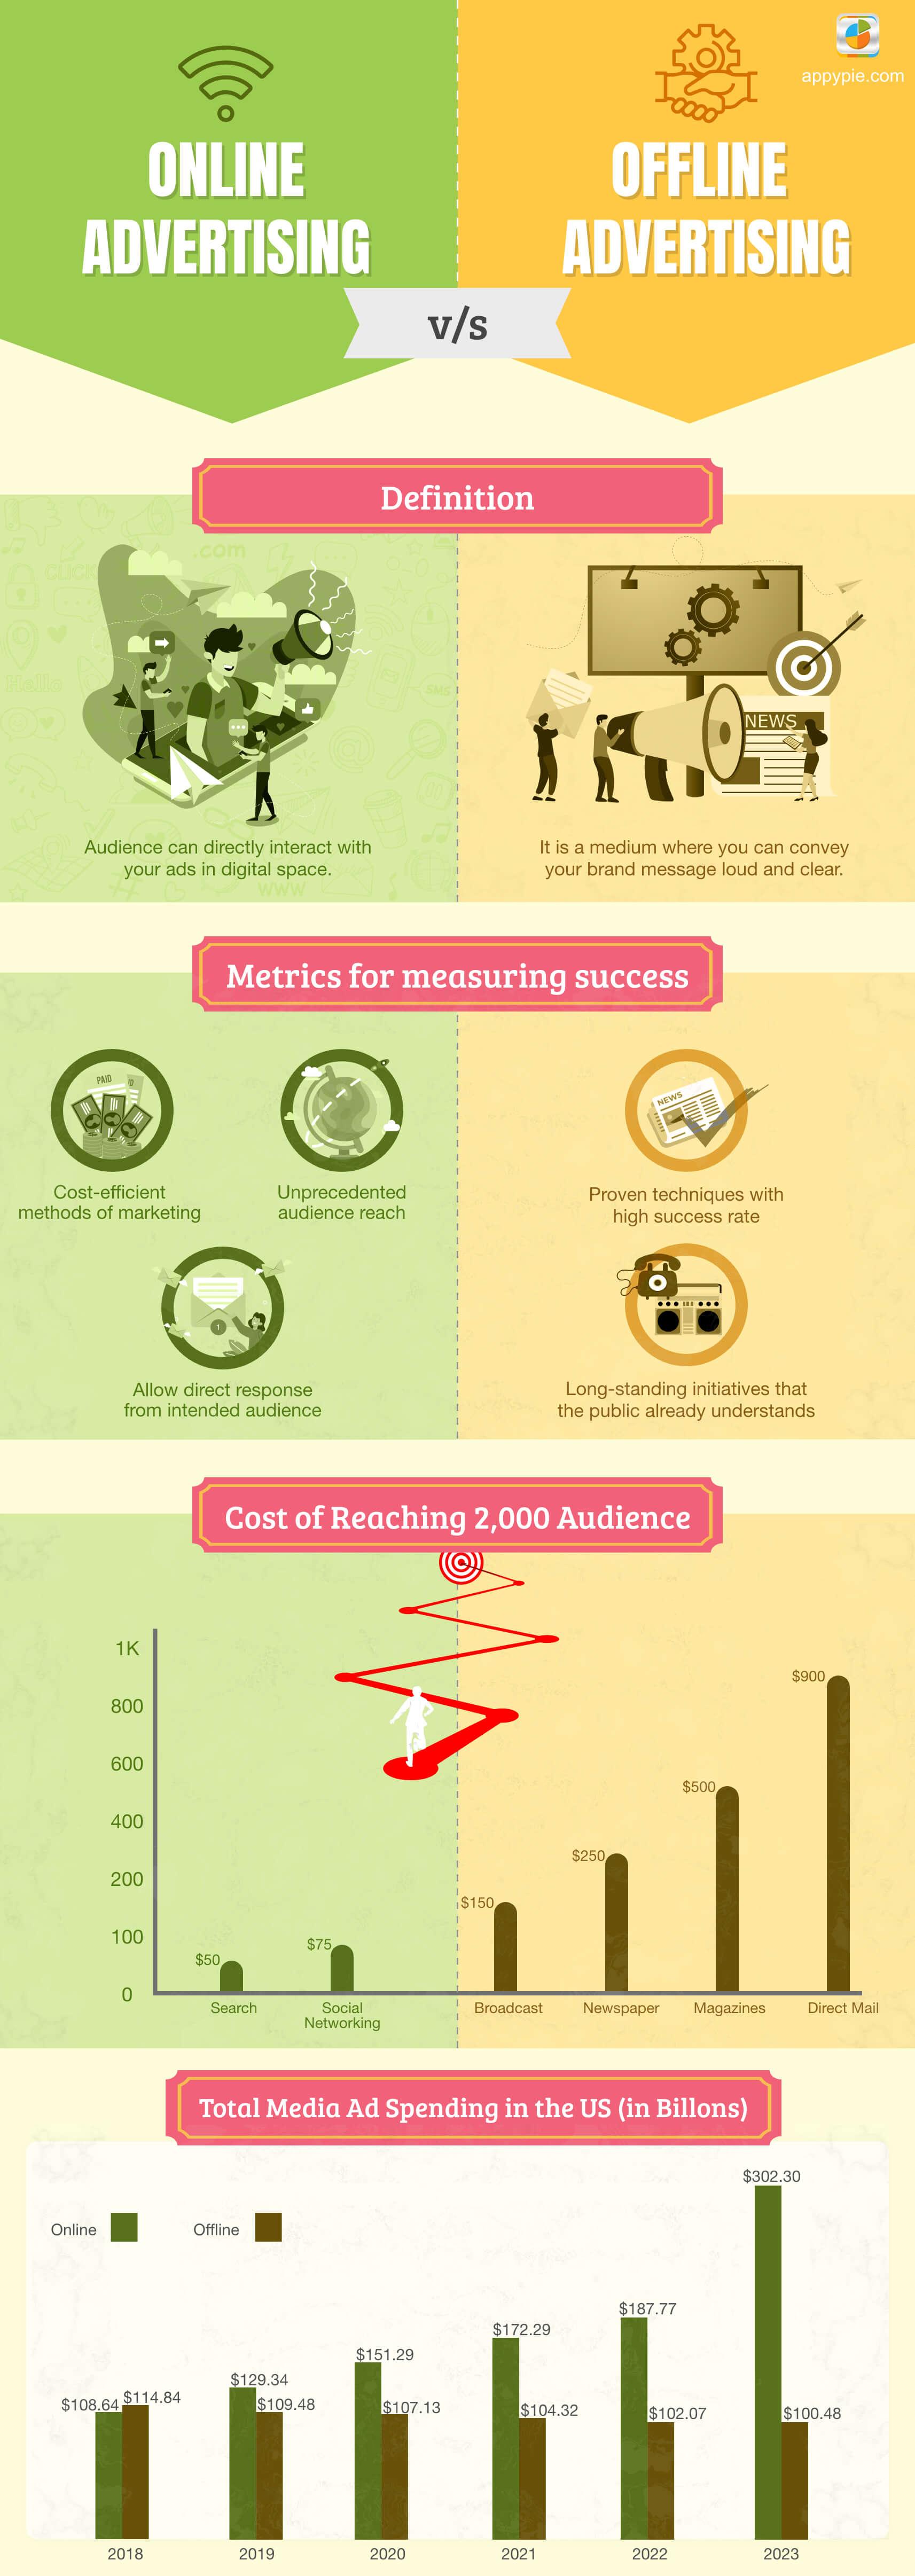 Online vs. Offline Advertising   Where to Invest